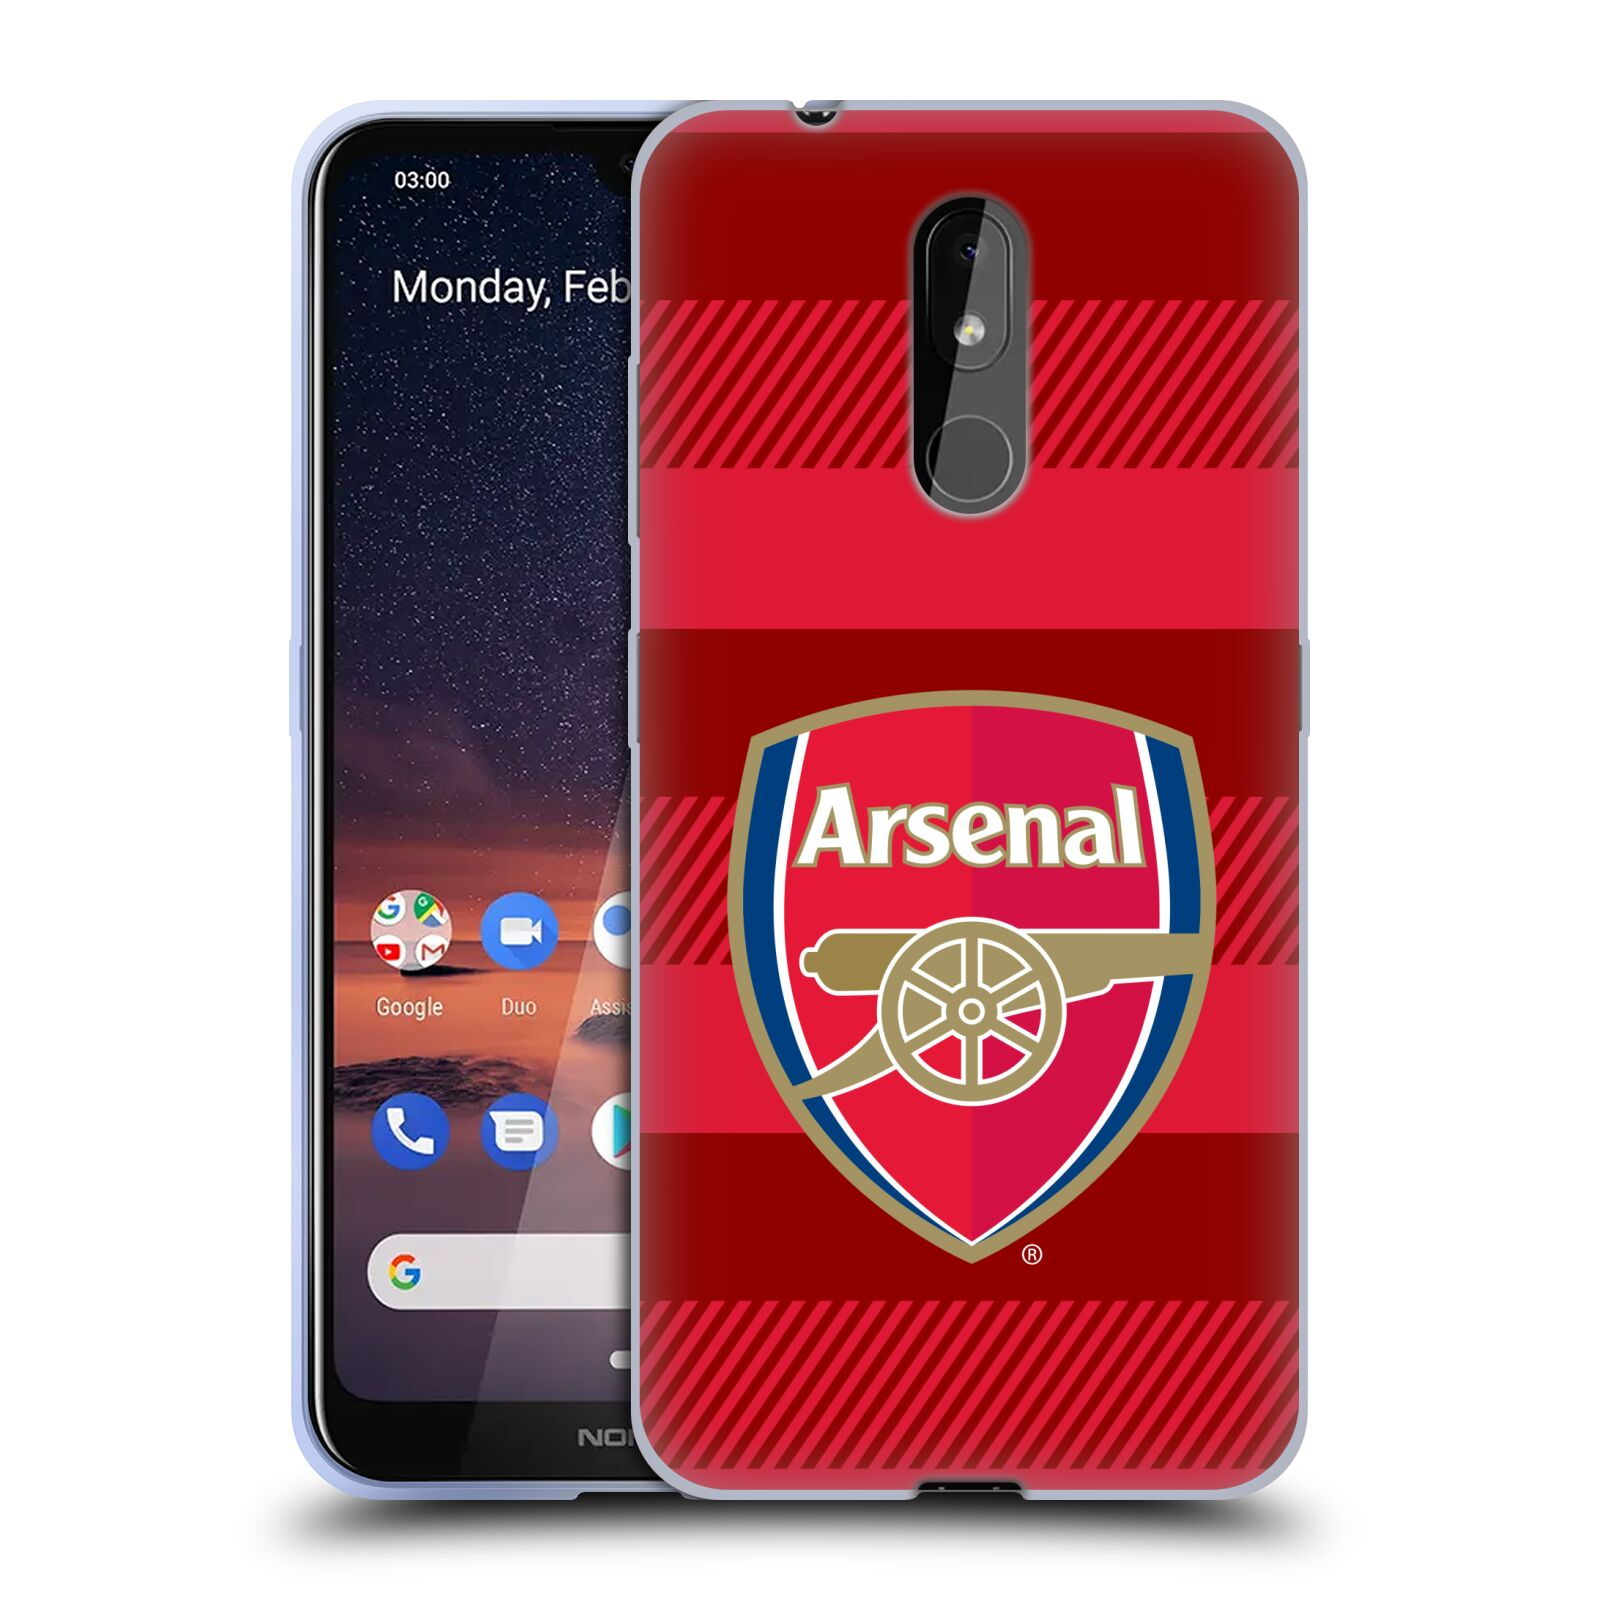 Silikonové pouzdro na mobil Nokia 3.2 - Head Case - Arsenal FC - Logo s pruhy